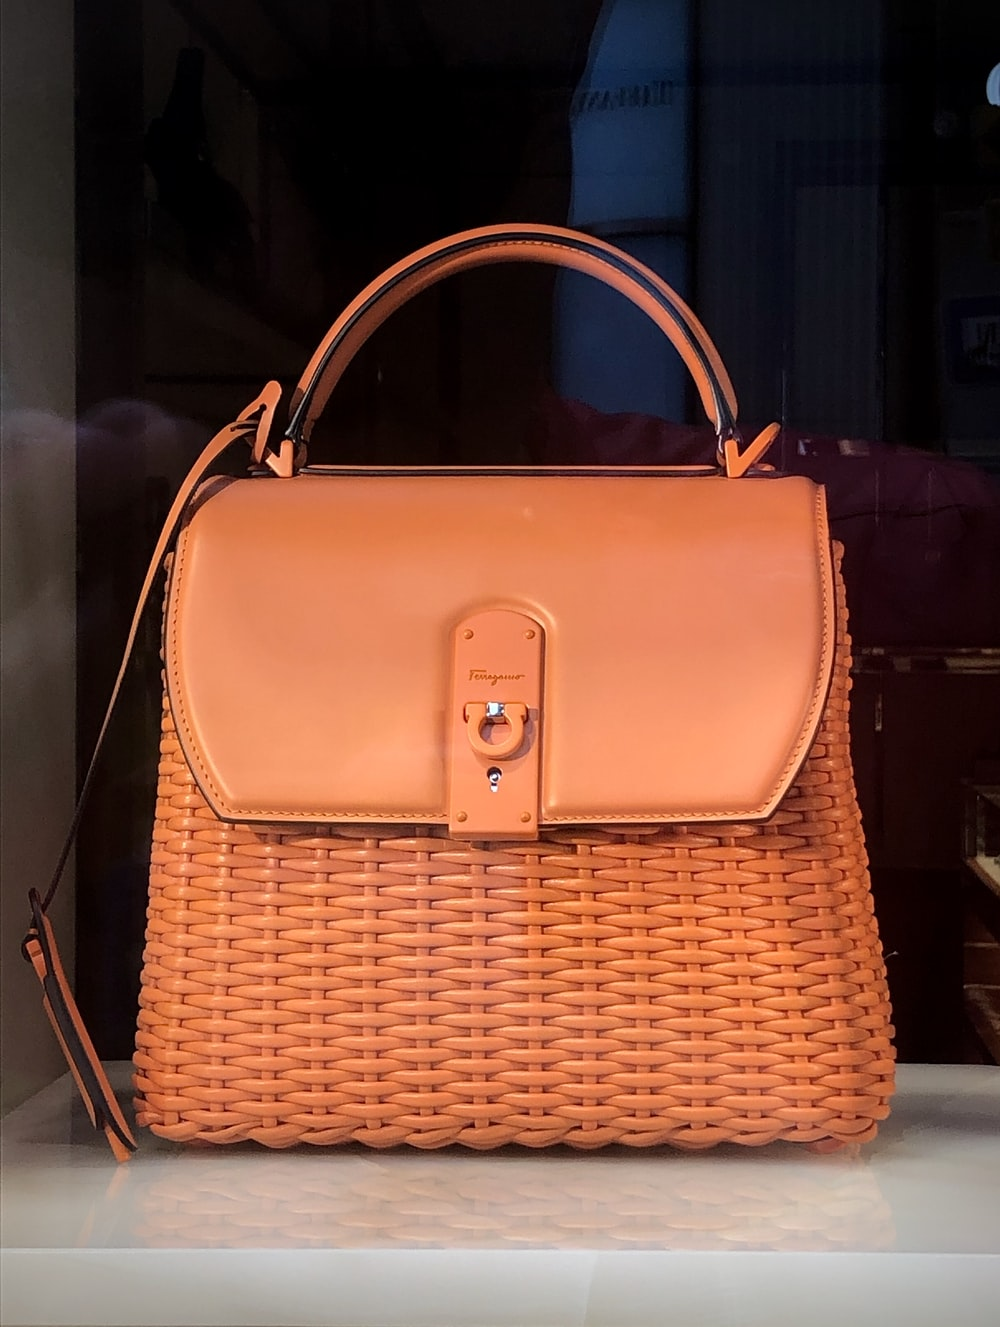 brown leather handbag on brown wooden table